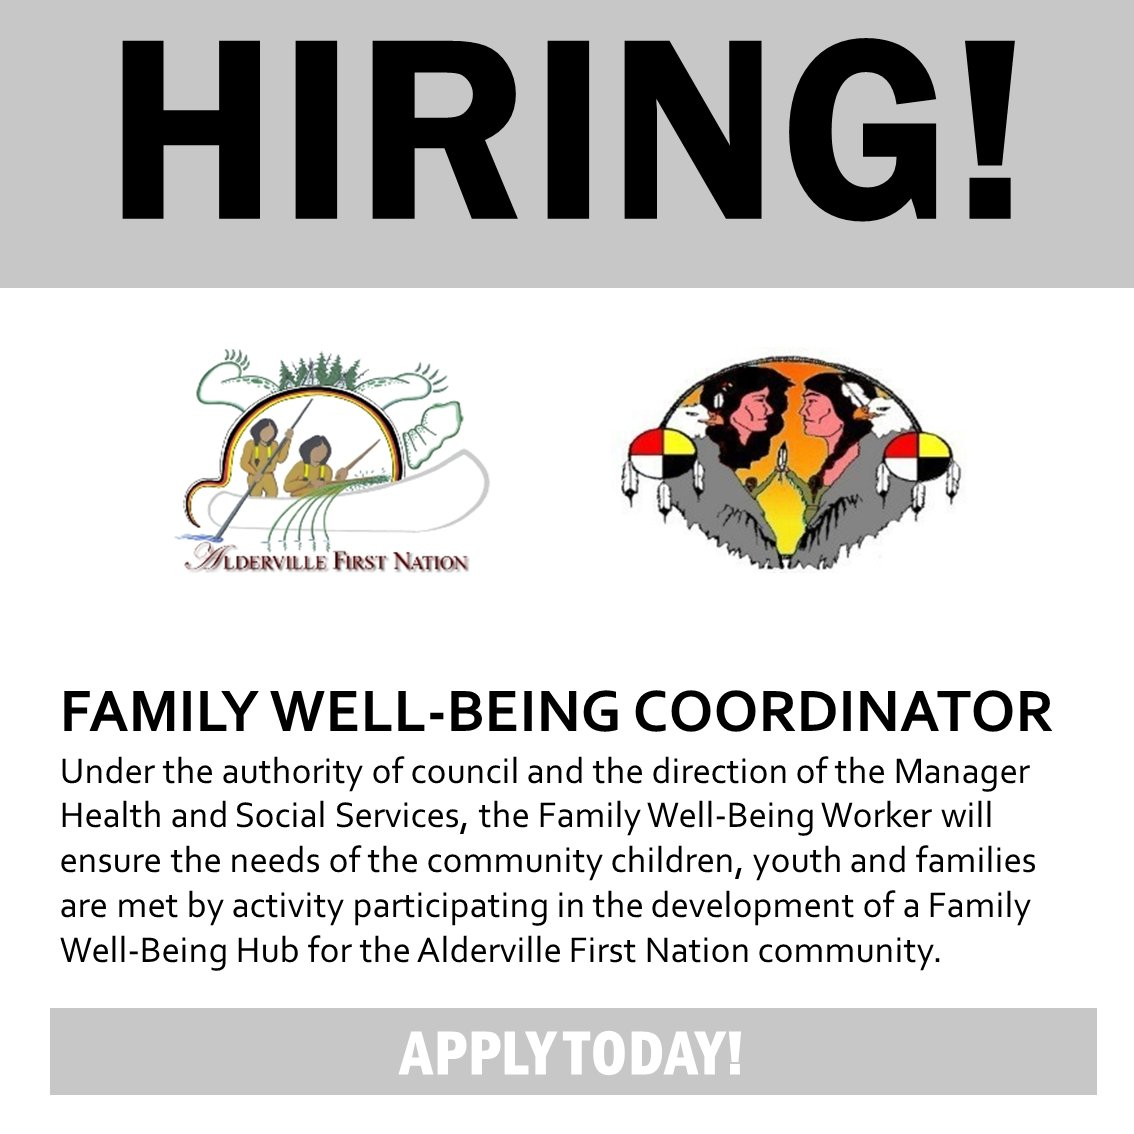 #Employment Opportunity Family Well-Being Coordinator - Alderville #FirstNation Deadline: Sept 28.  http:// anishinabeknews.ca/2017/08/31/fam ily-well-being-coordinator/ &nbsp; … <br>http://pic.twitter.com/snq6wGCC3P